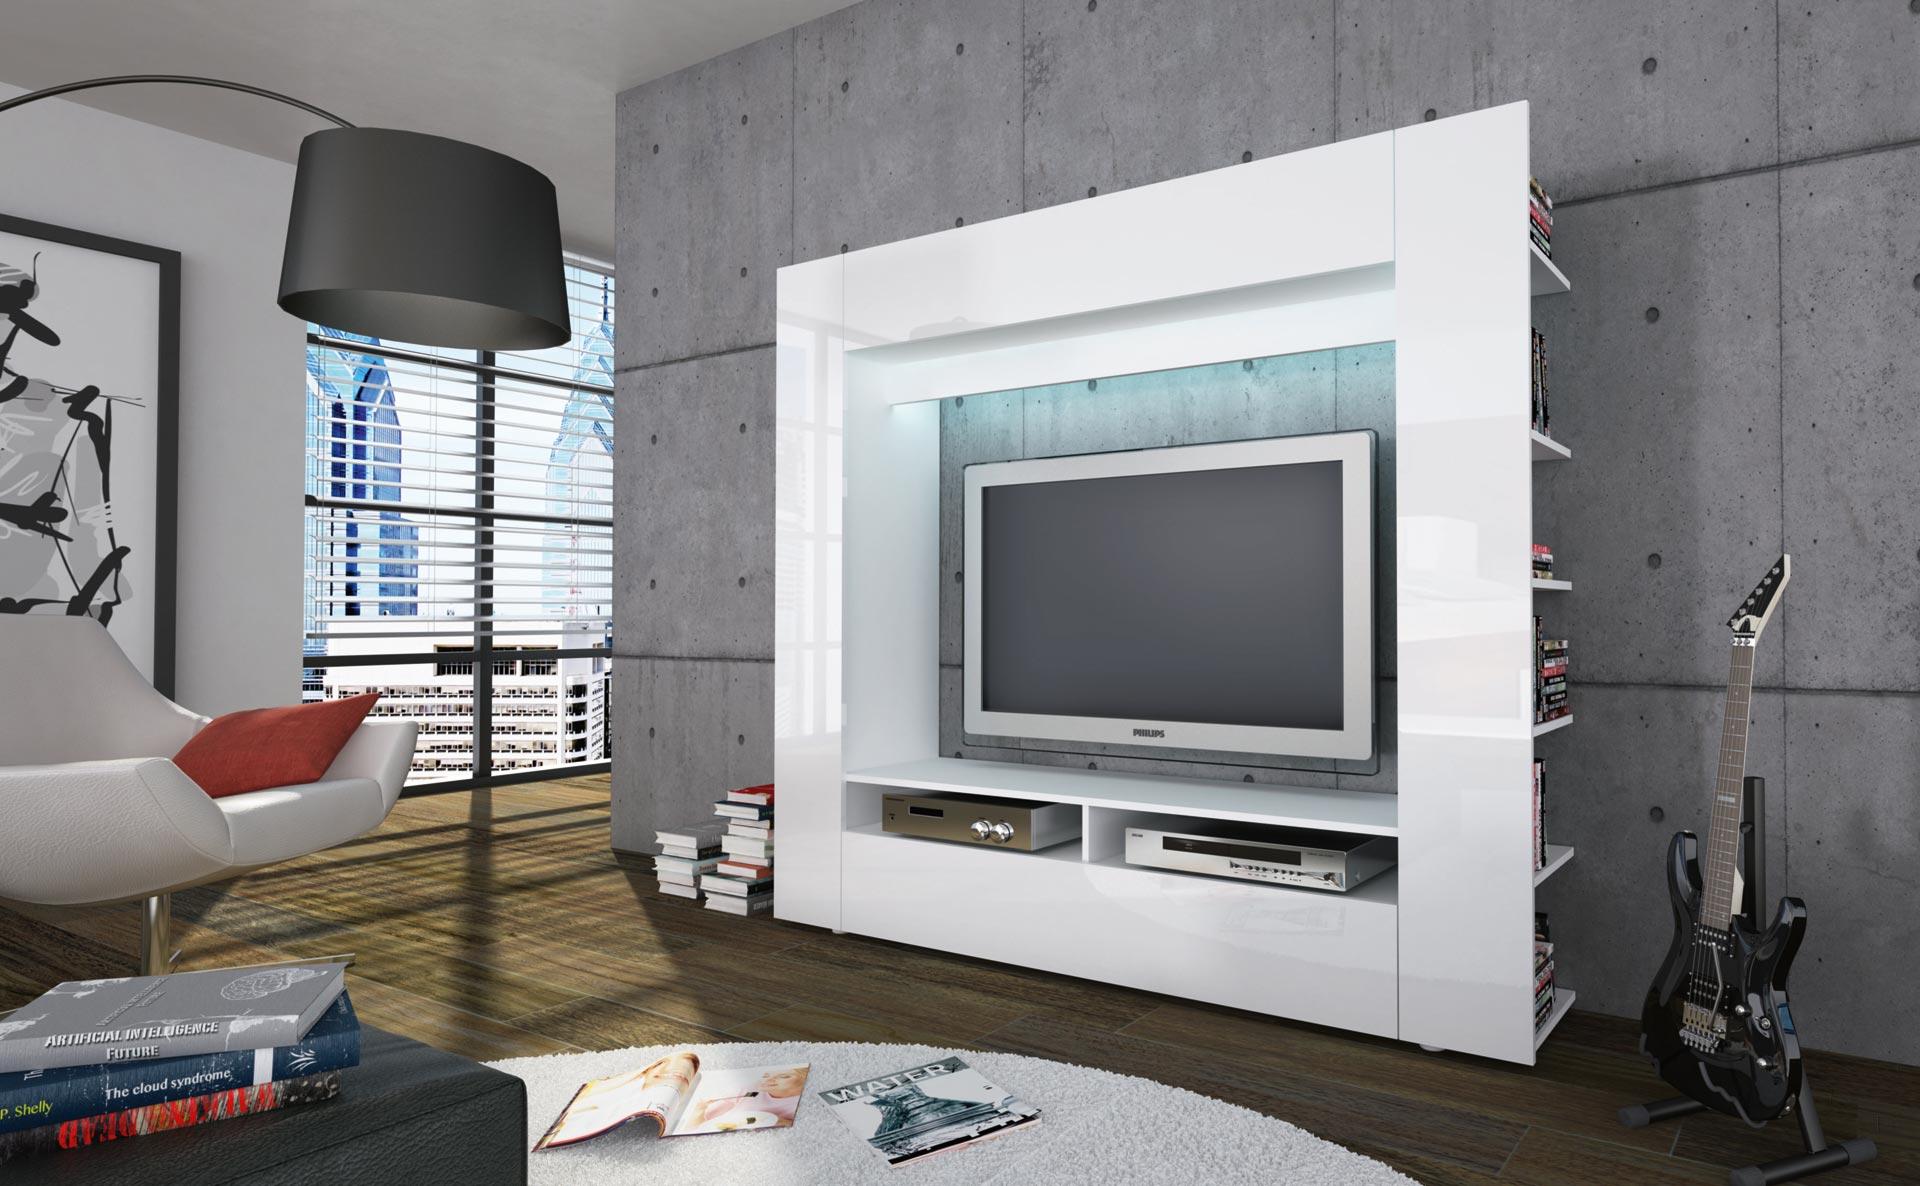 moderne anbauwand mediacenter wohnwand schrankwand olli wei schwarz hochglanz ebay. Black Bedroom Furniture Sets. Home Design Ideas